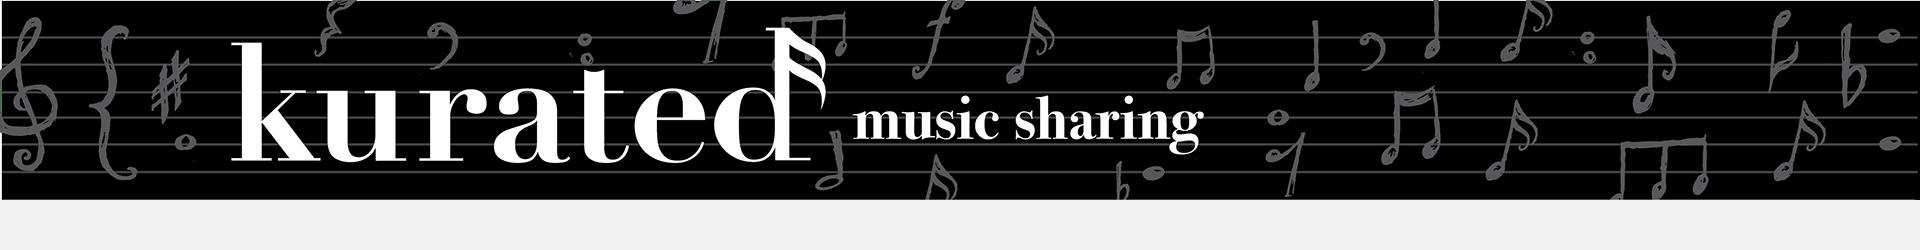 59 B Didot Musical Note Final2